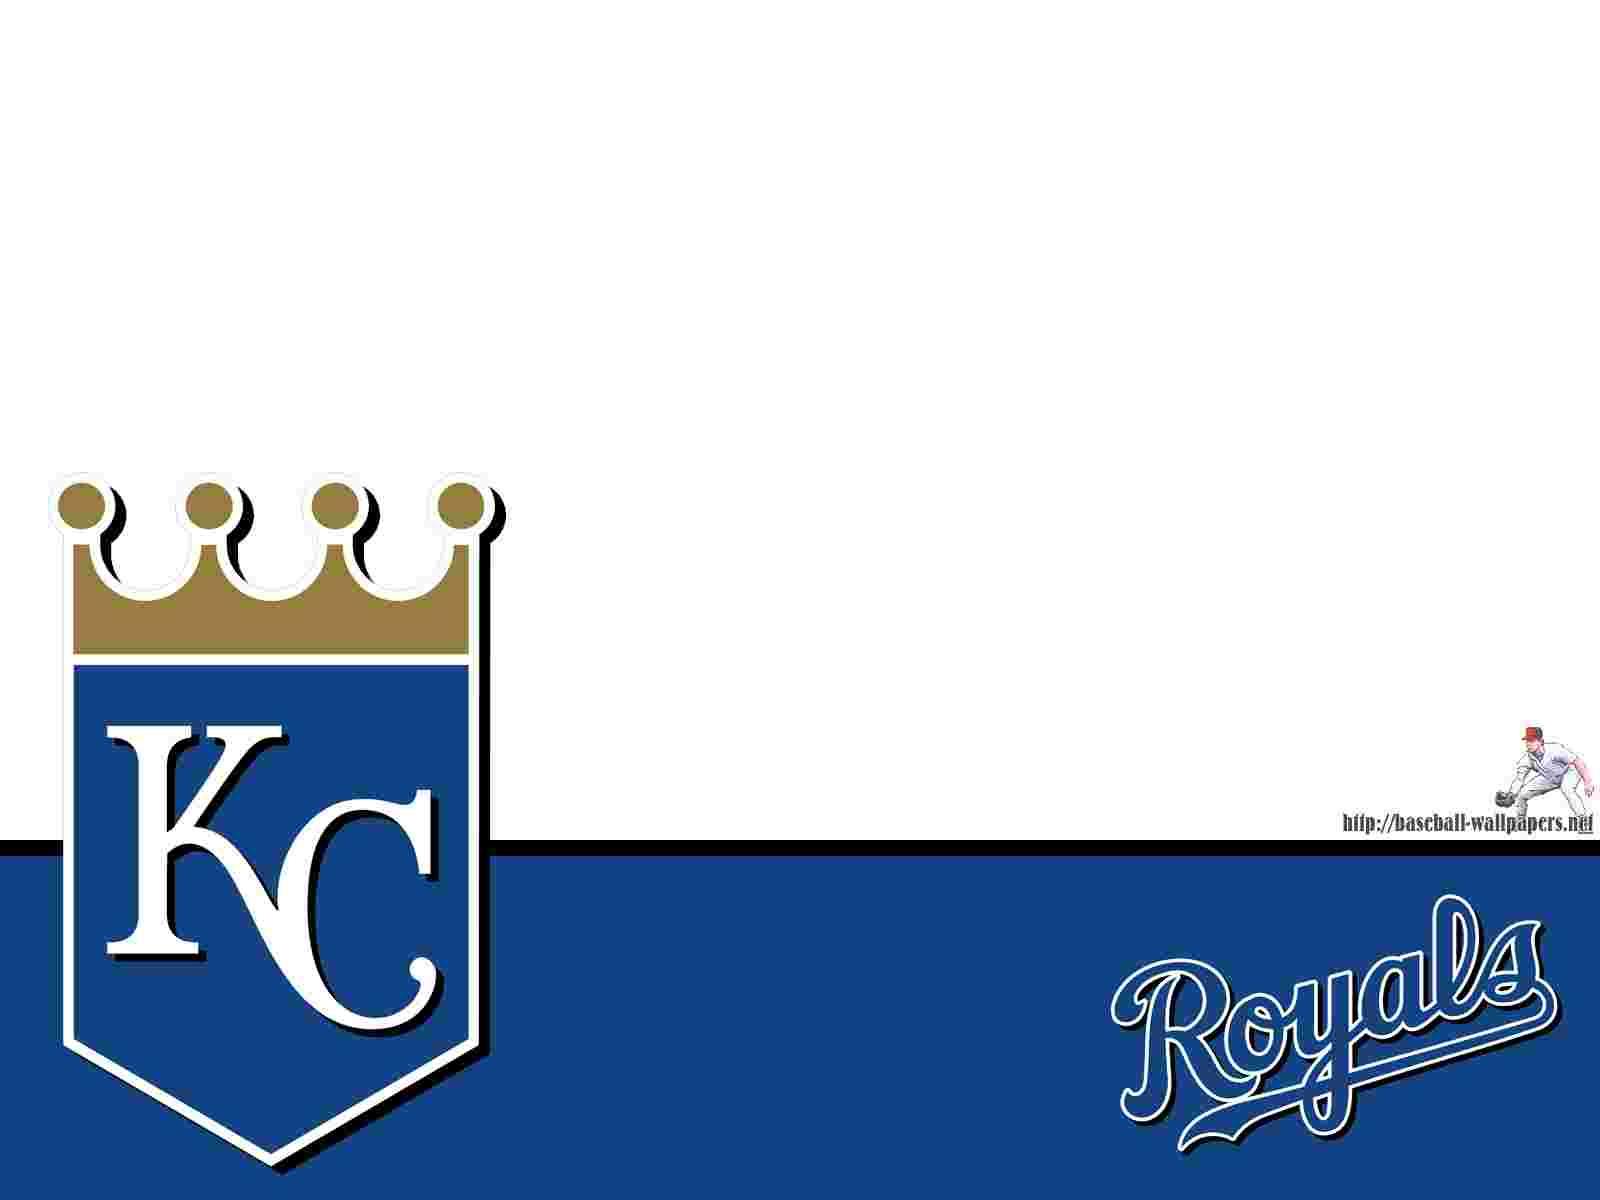 kansas city royals logo wallpaper   Baseball   Sport   Wallpaper 1600x1200